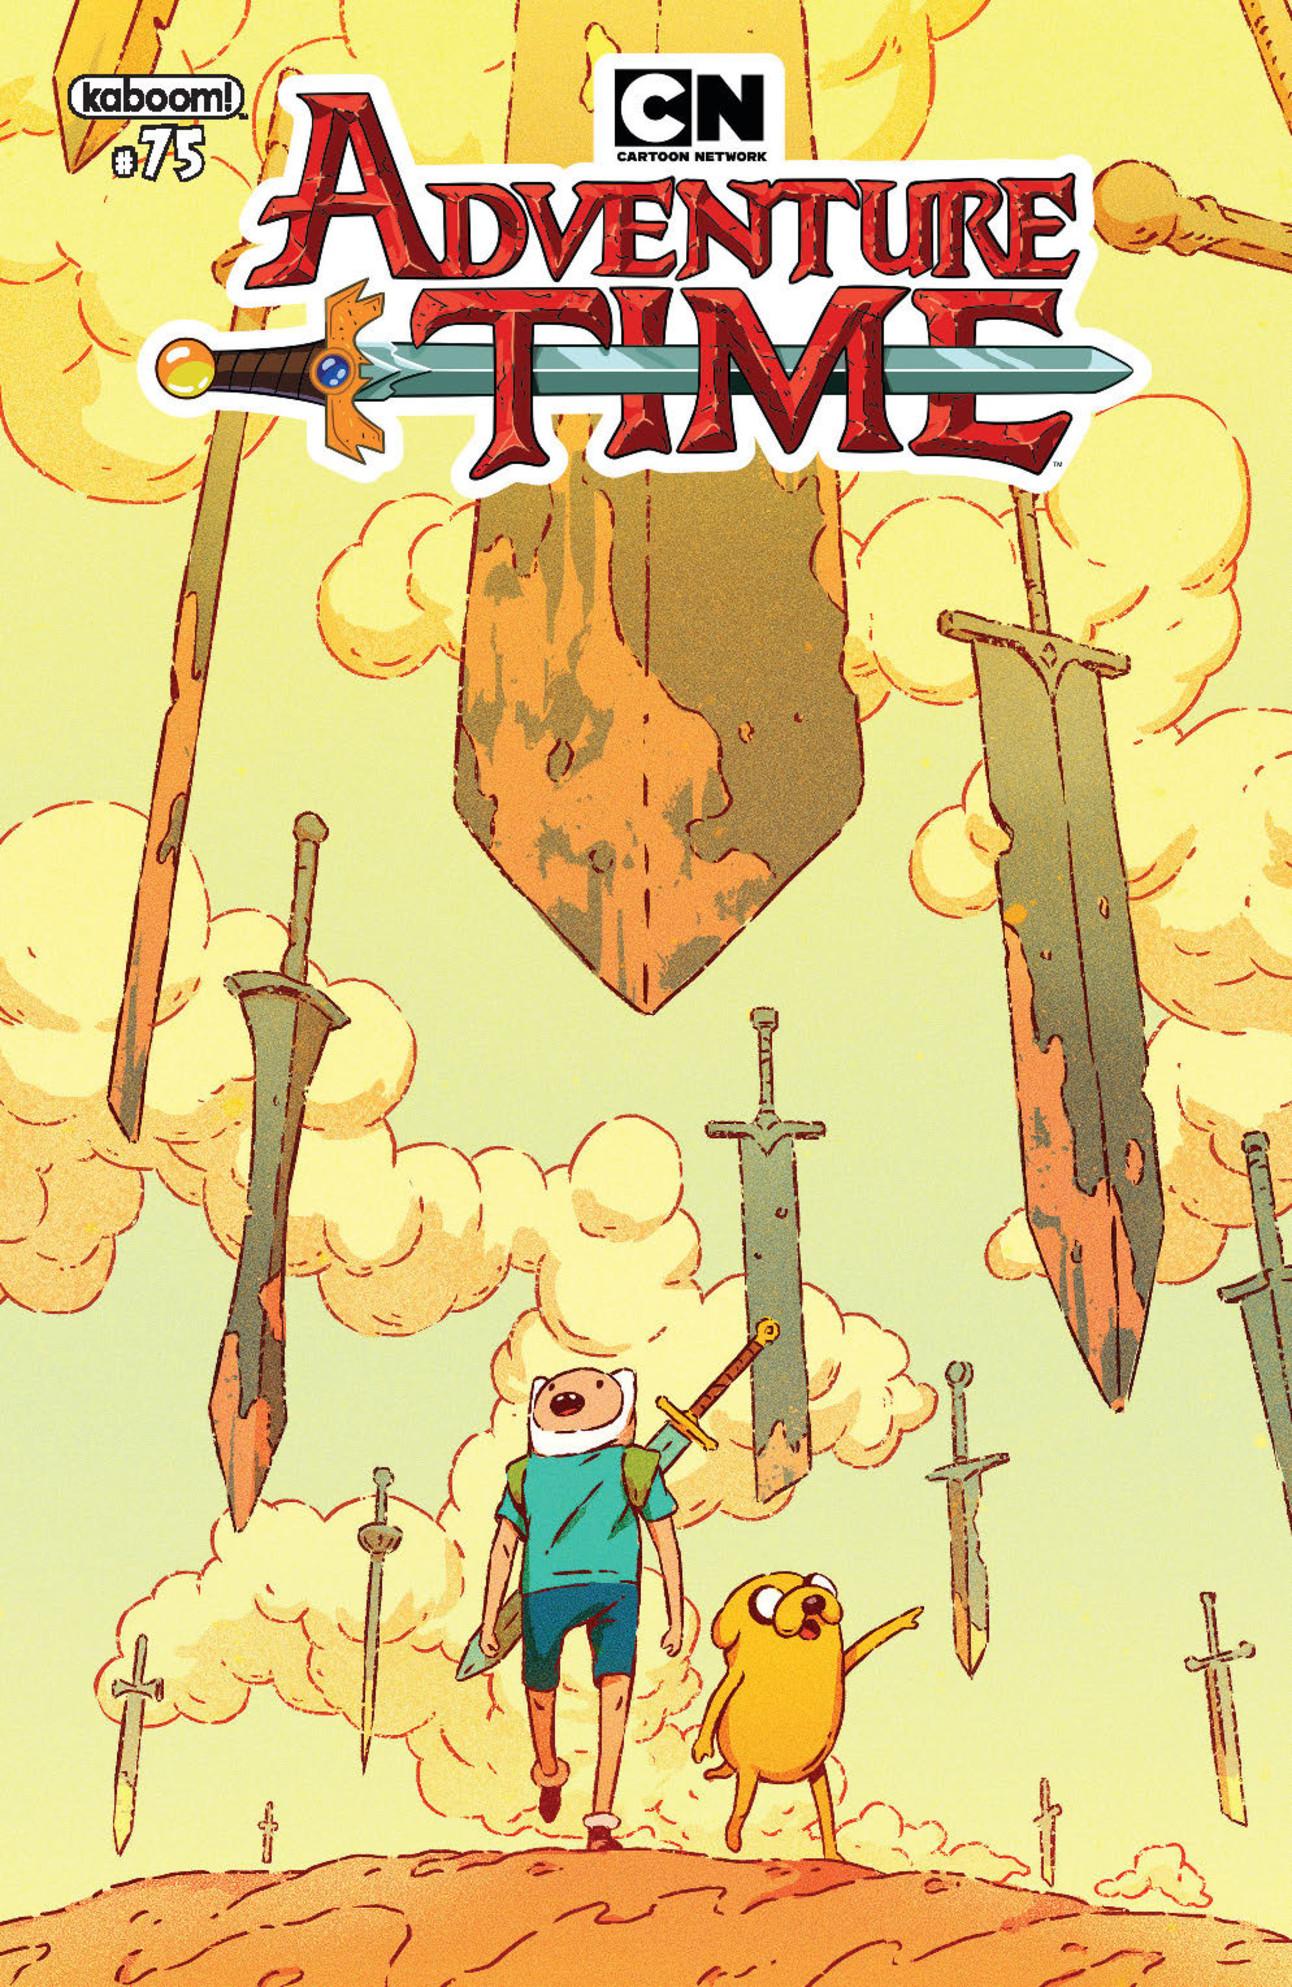 boom_adventure_time_75.jpg